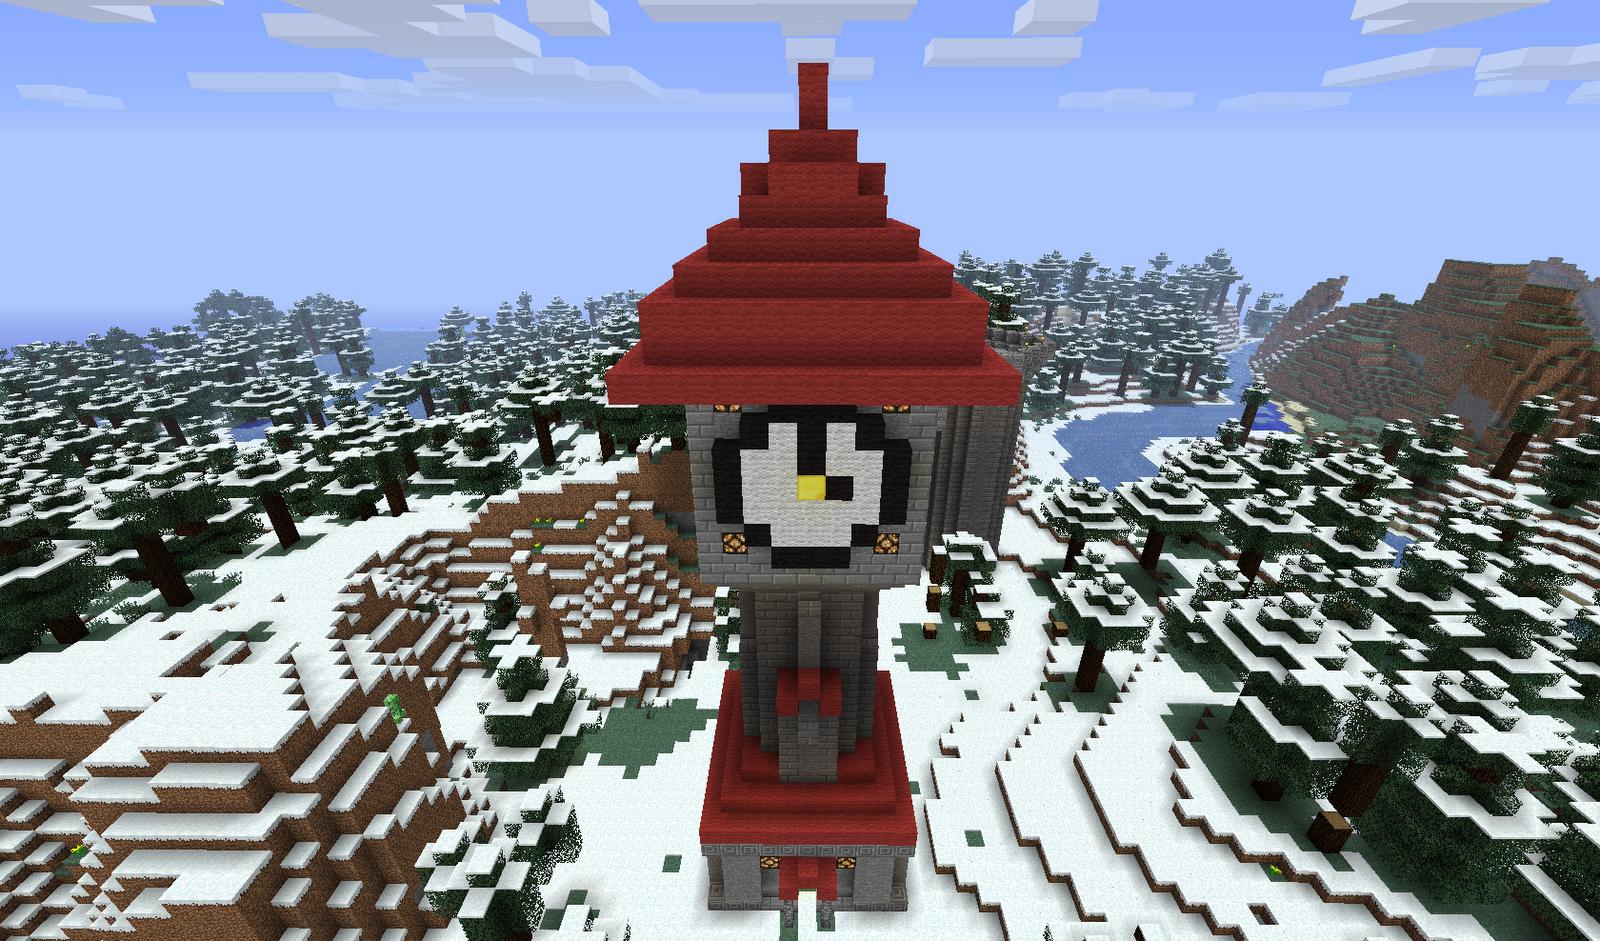 minecraft building ideas clock tower